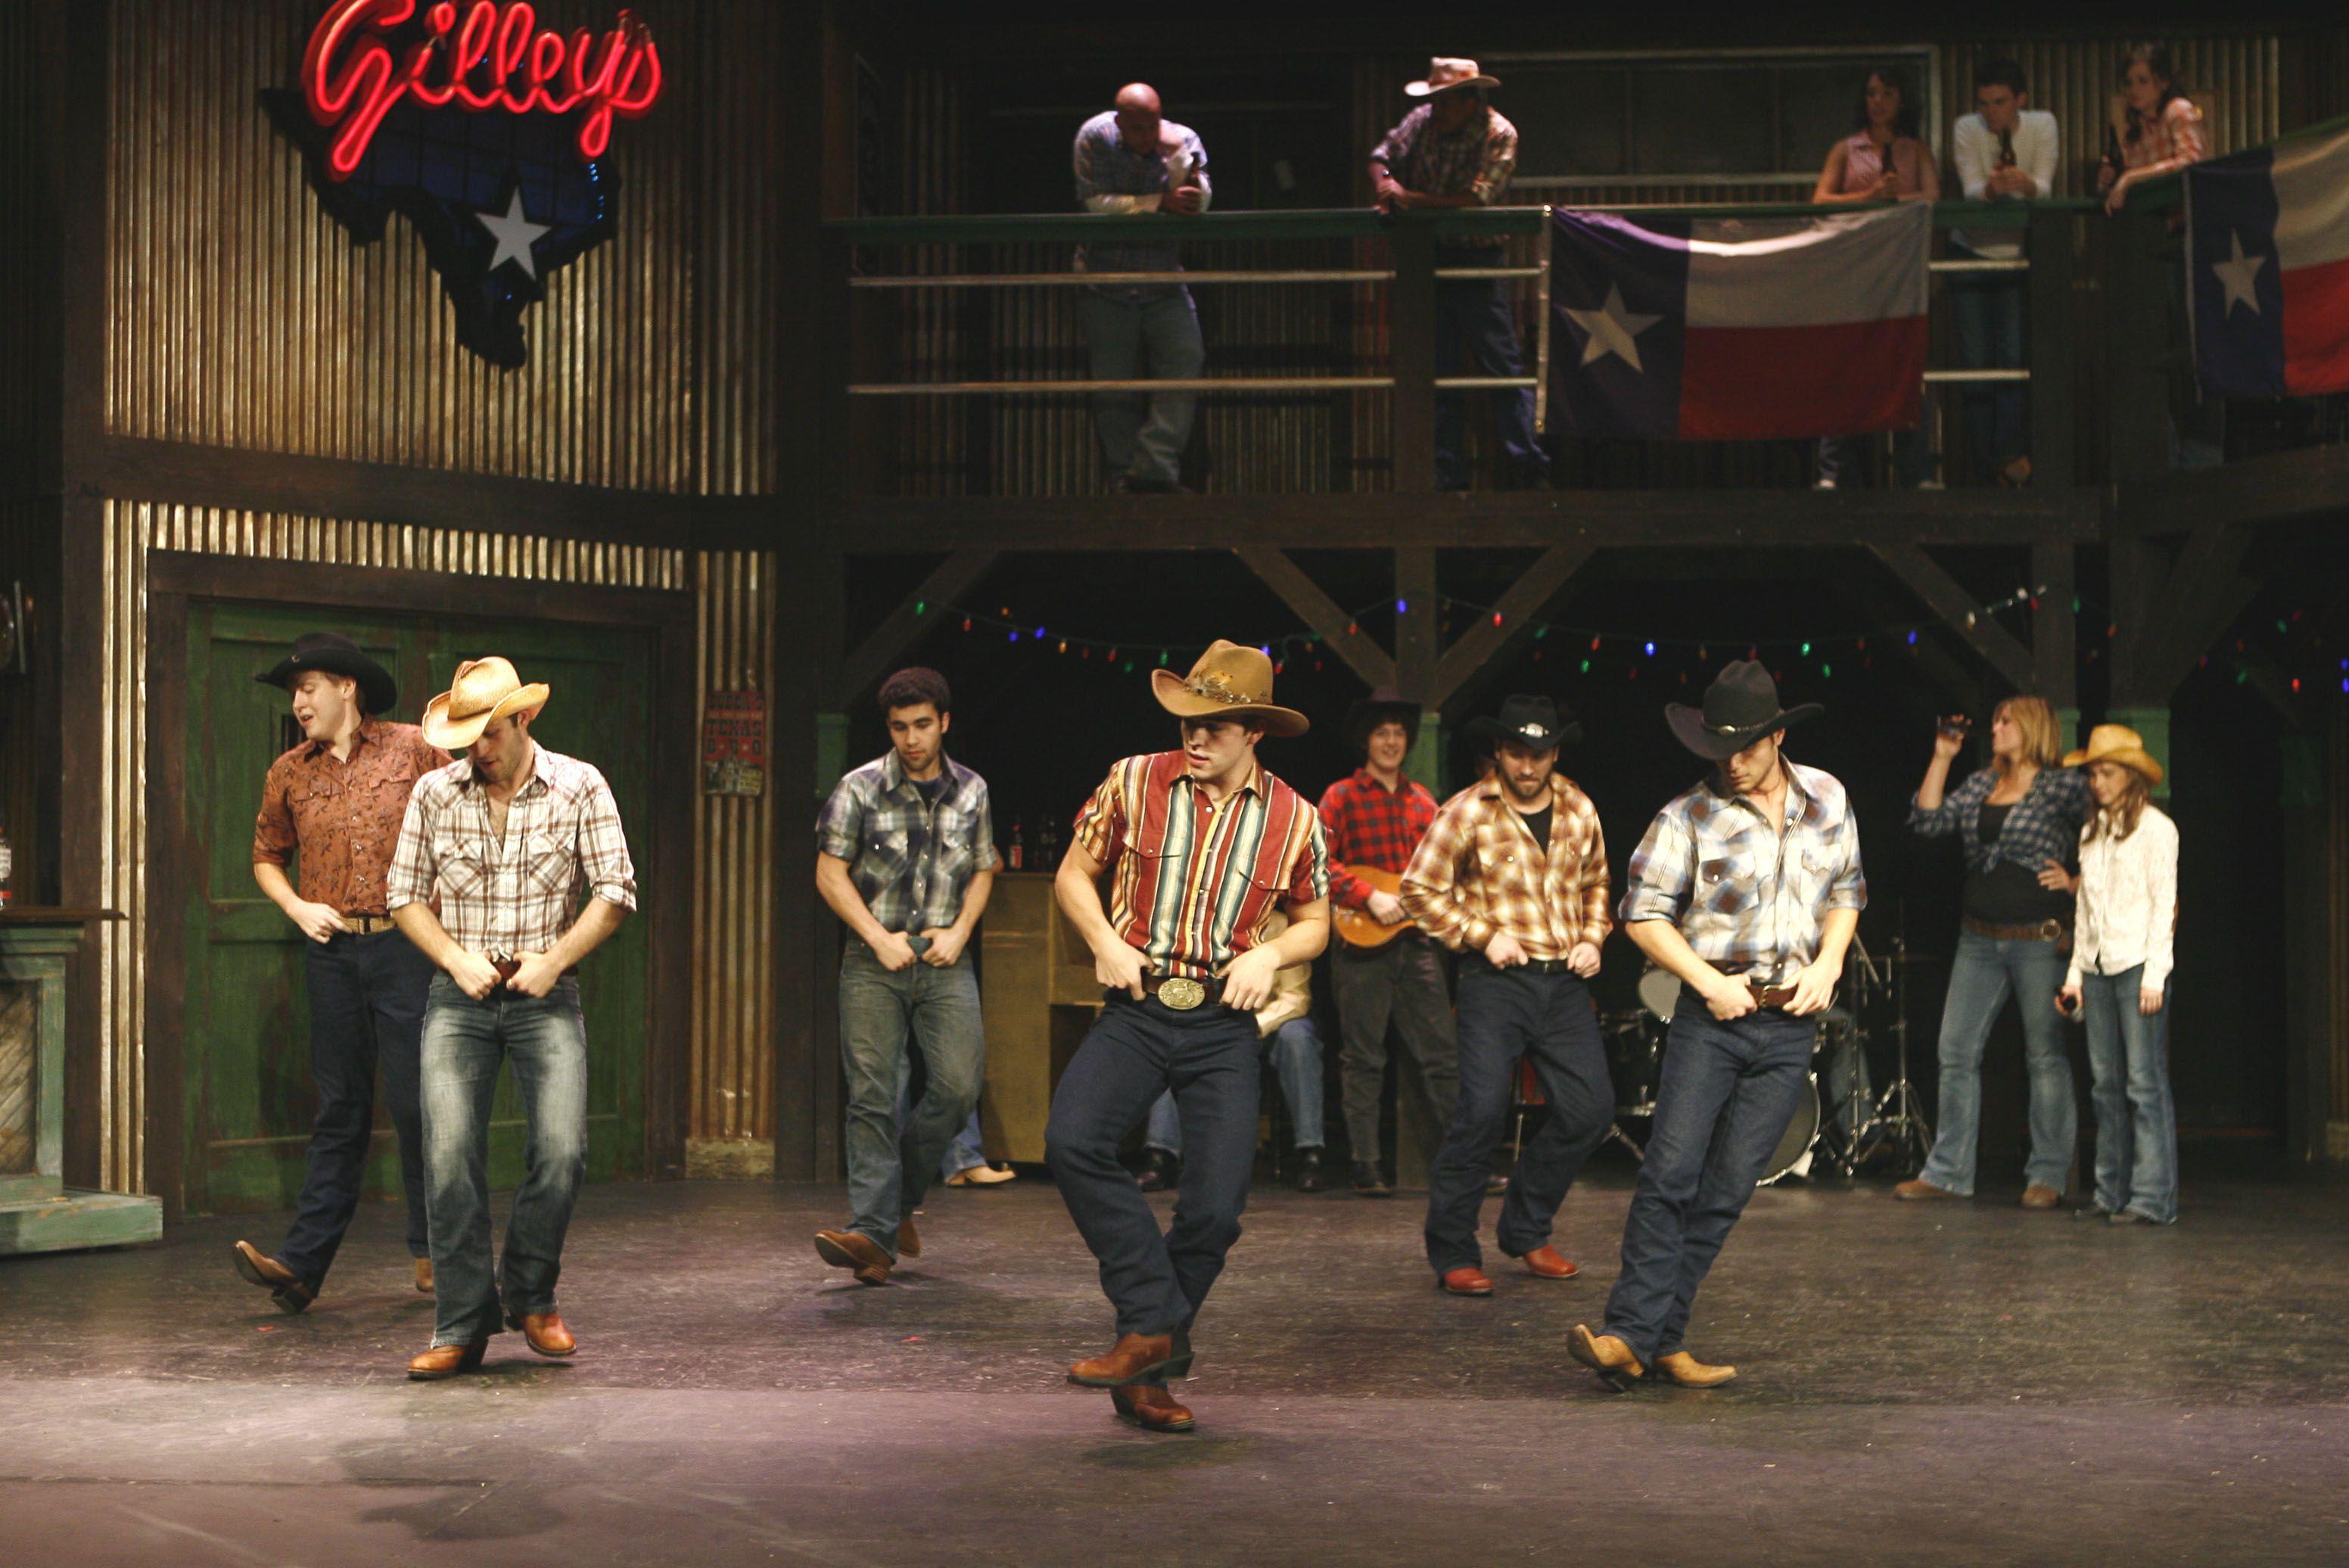 cowboy dance | TheUrbanCowboyMusical I need to learn to line